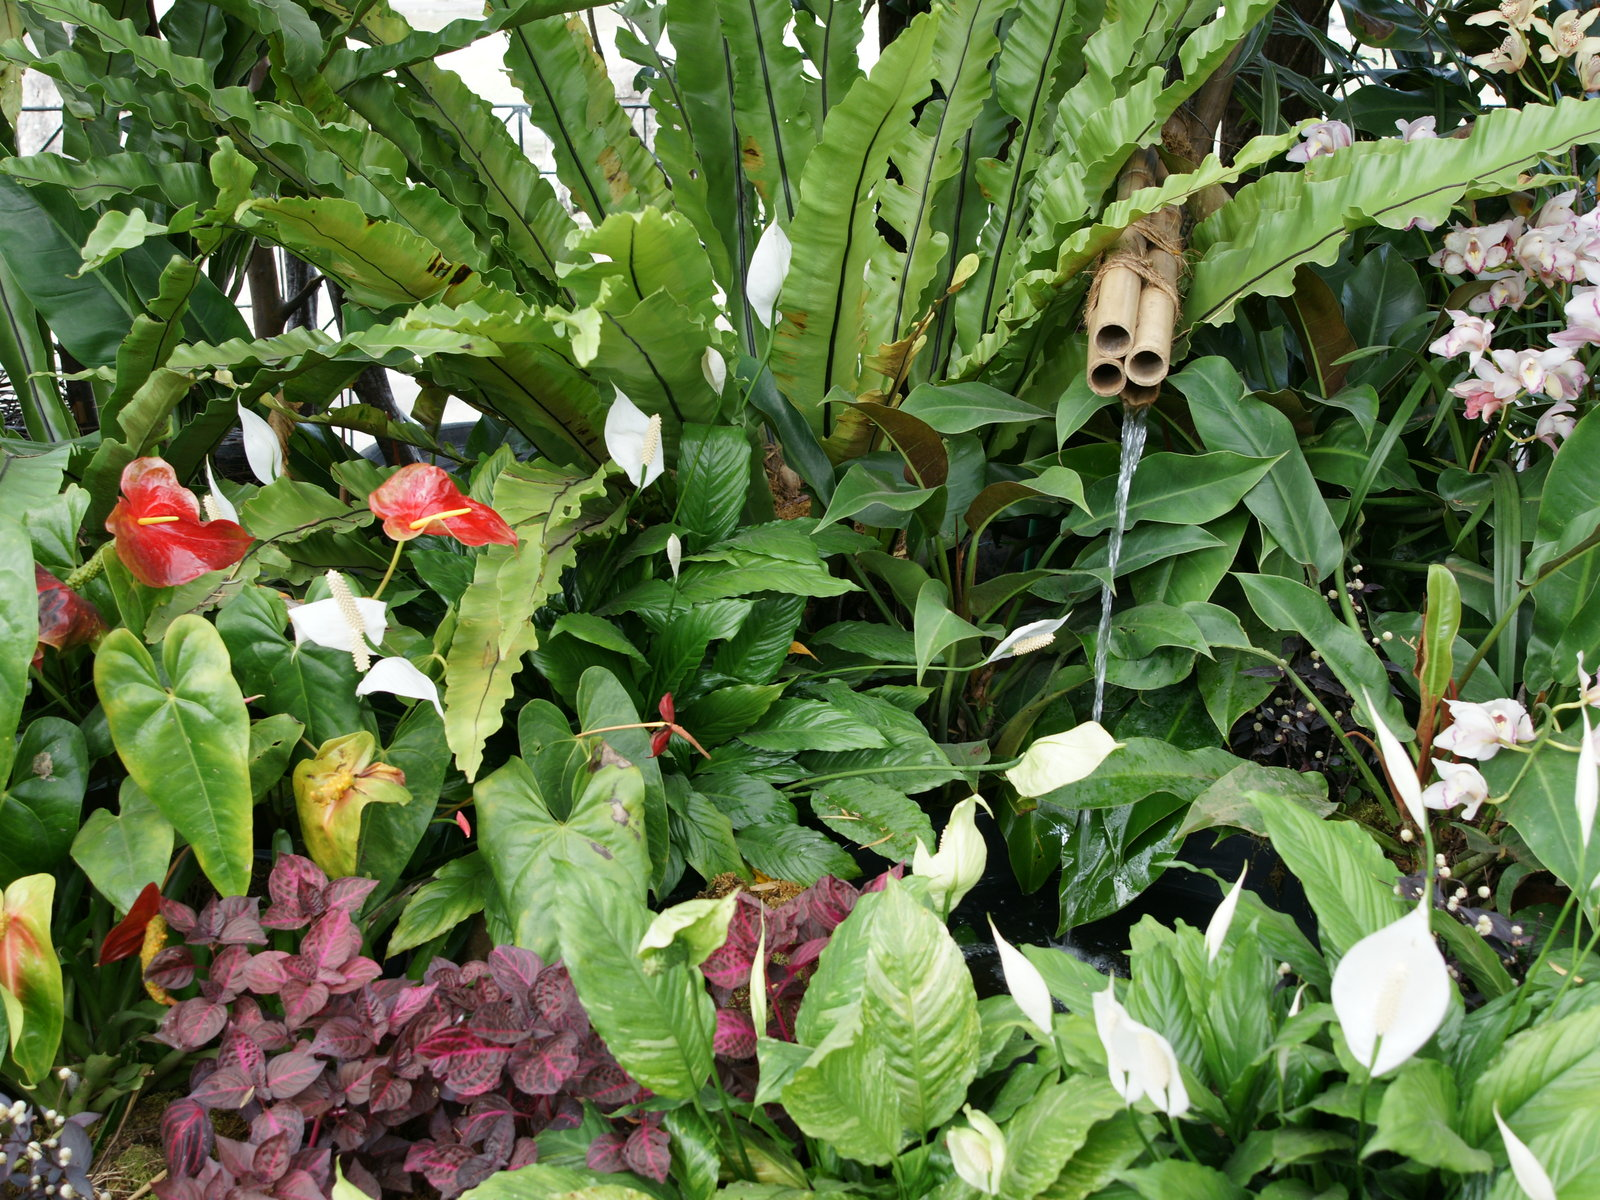 plantas jardim tropical : plantas jardim tropical: : plantas, flores e jardinagem : Plantas para um jardim tropical